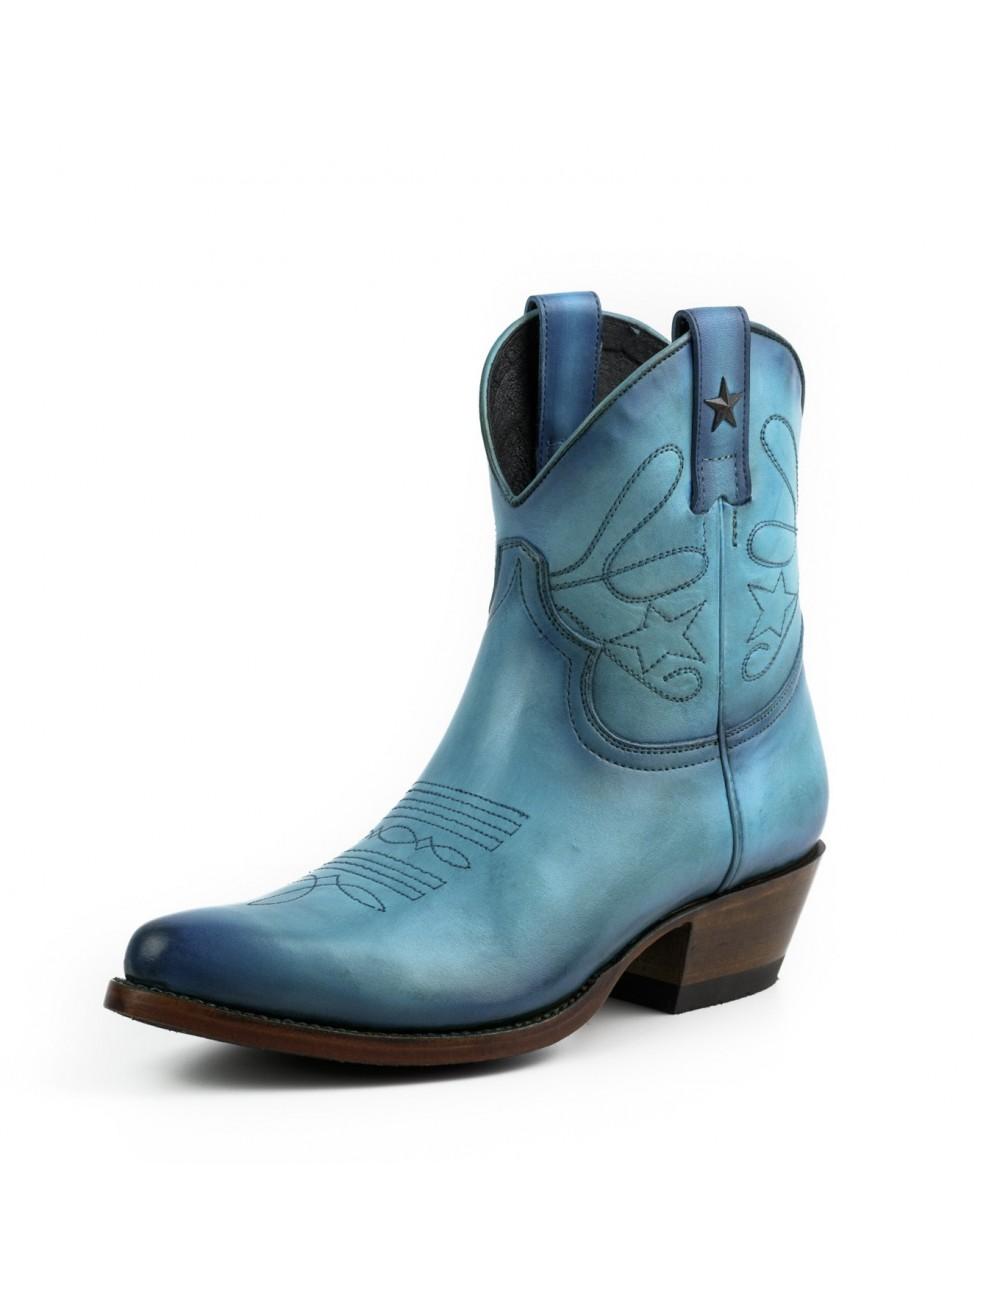 Bottines santiag femme bleu cuir - Bottines cowboy artisanales